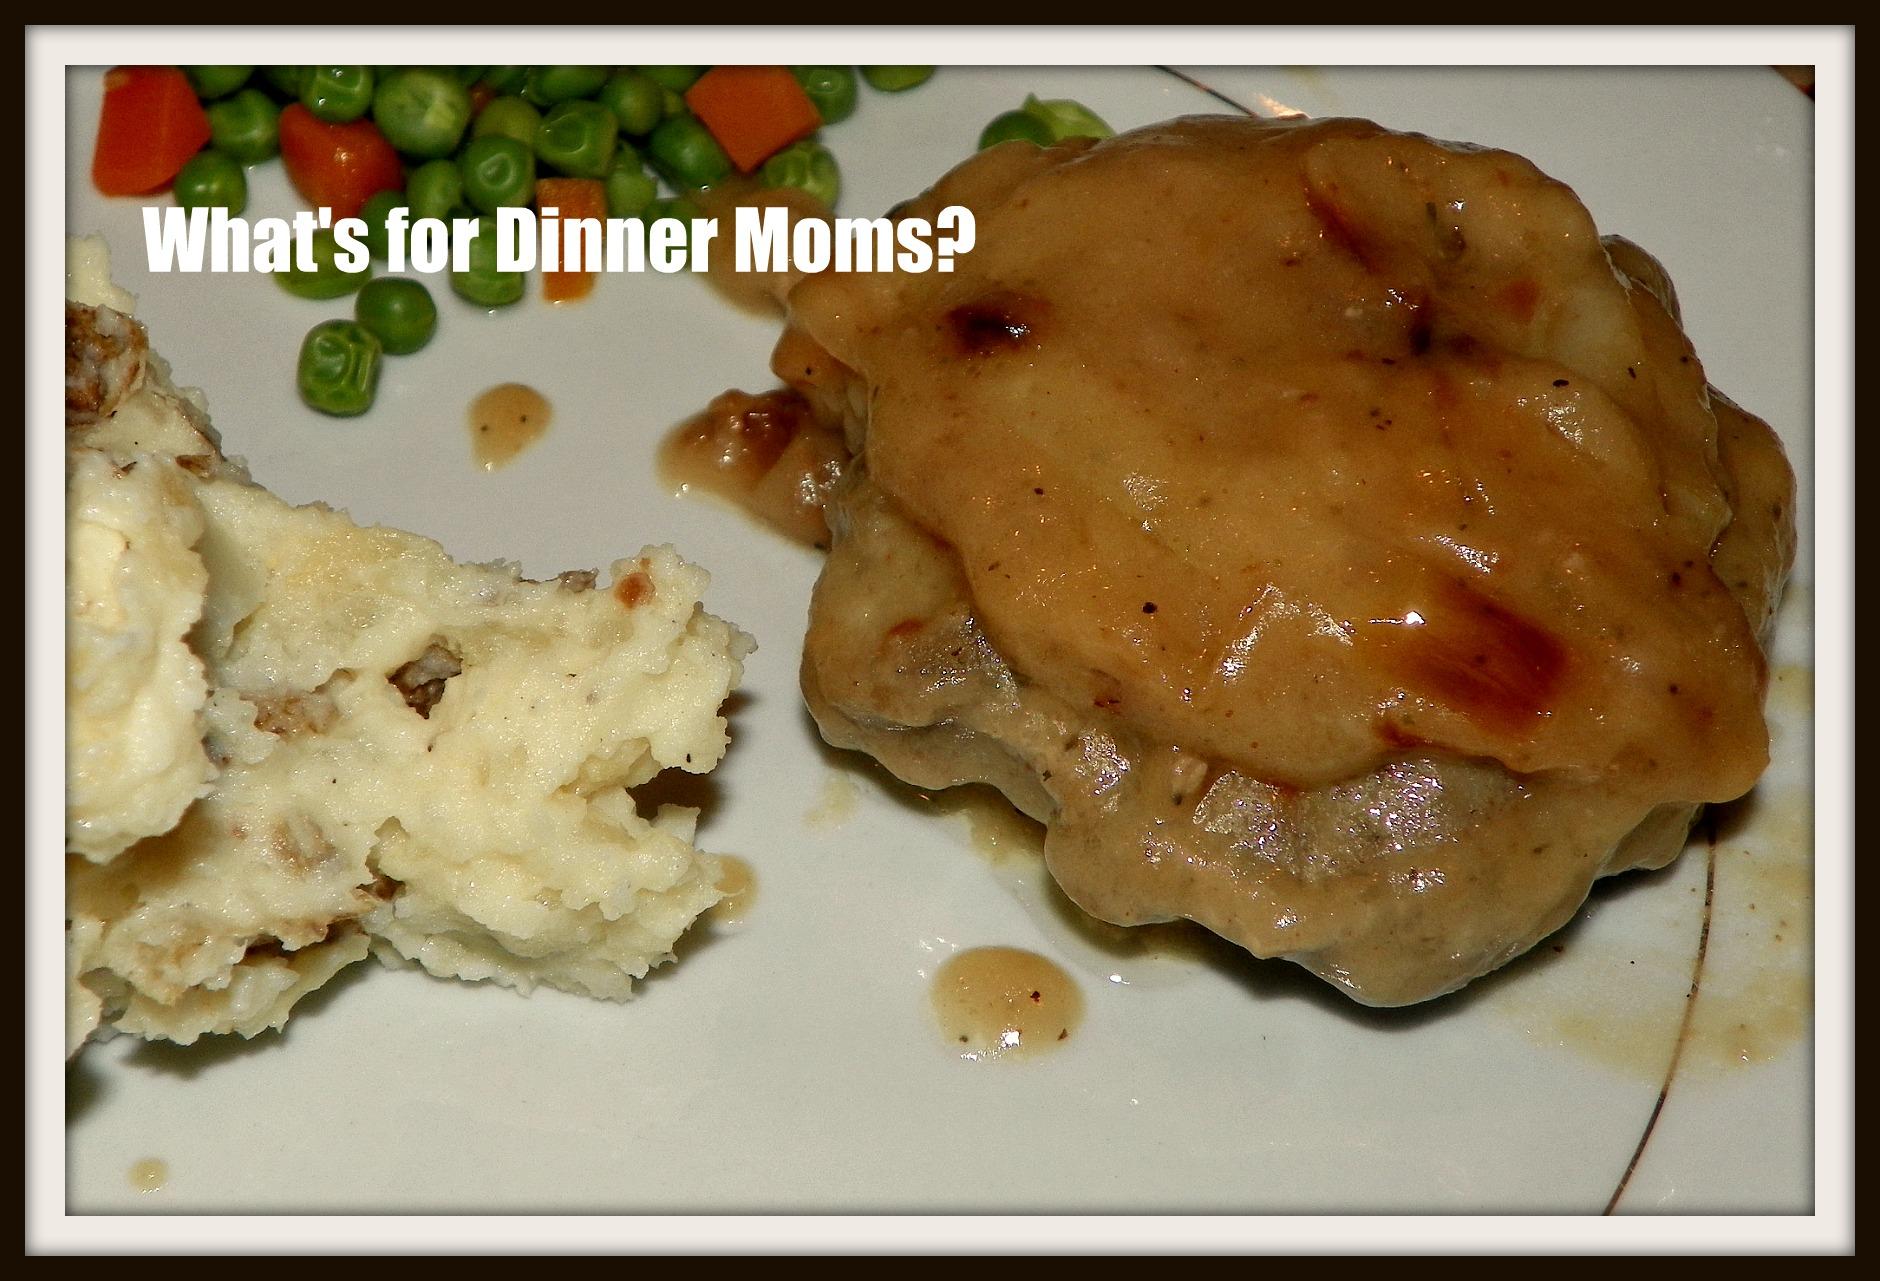 Hamburger Steaks with Onion Gravy | What's for Dinner Moms?